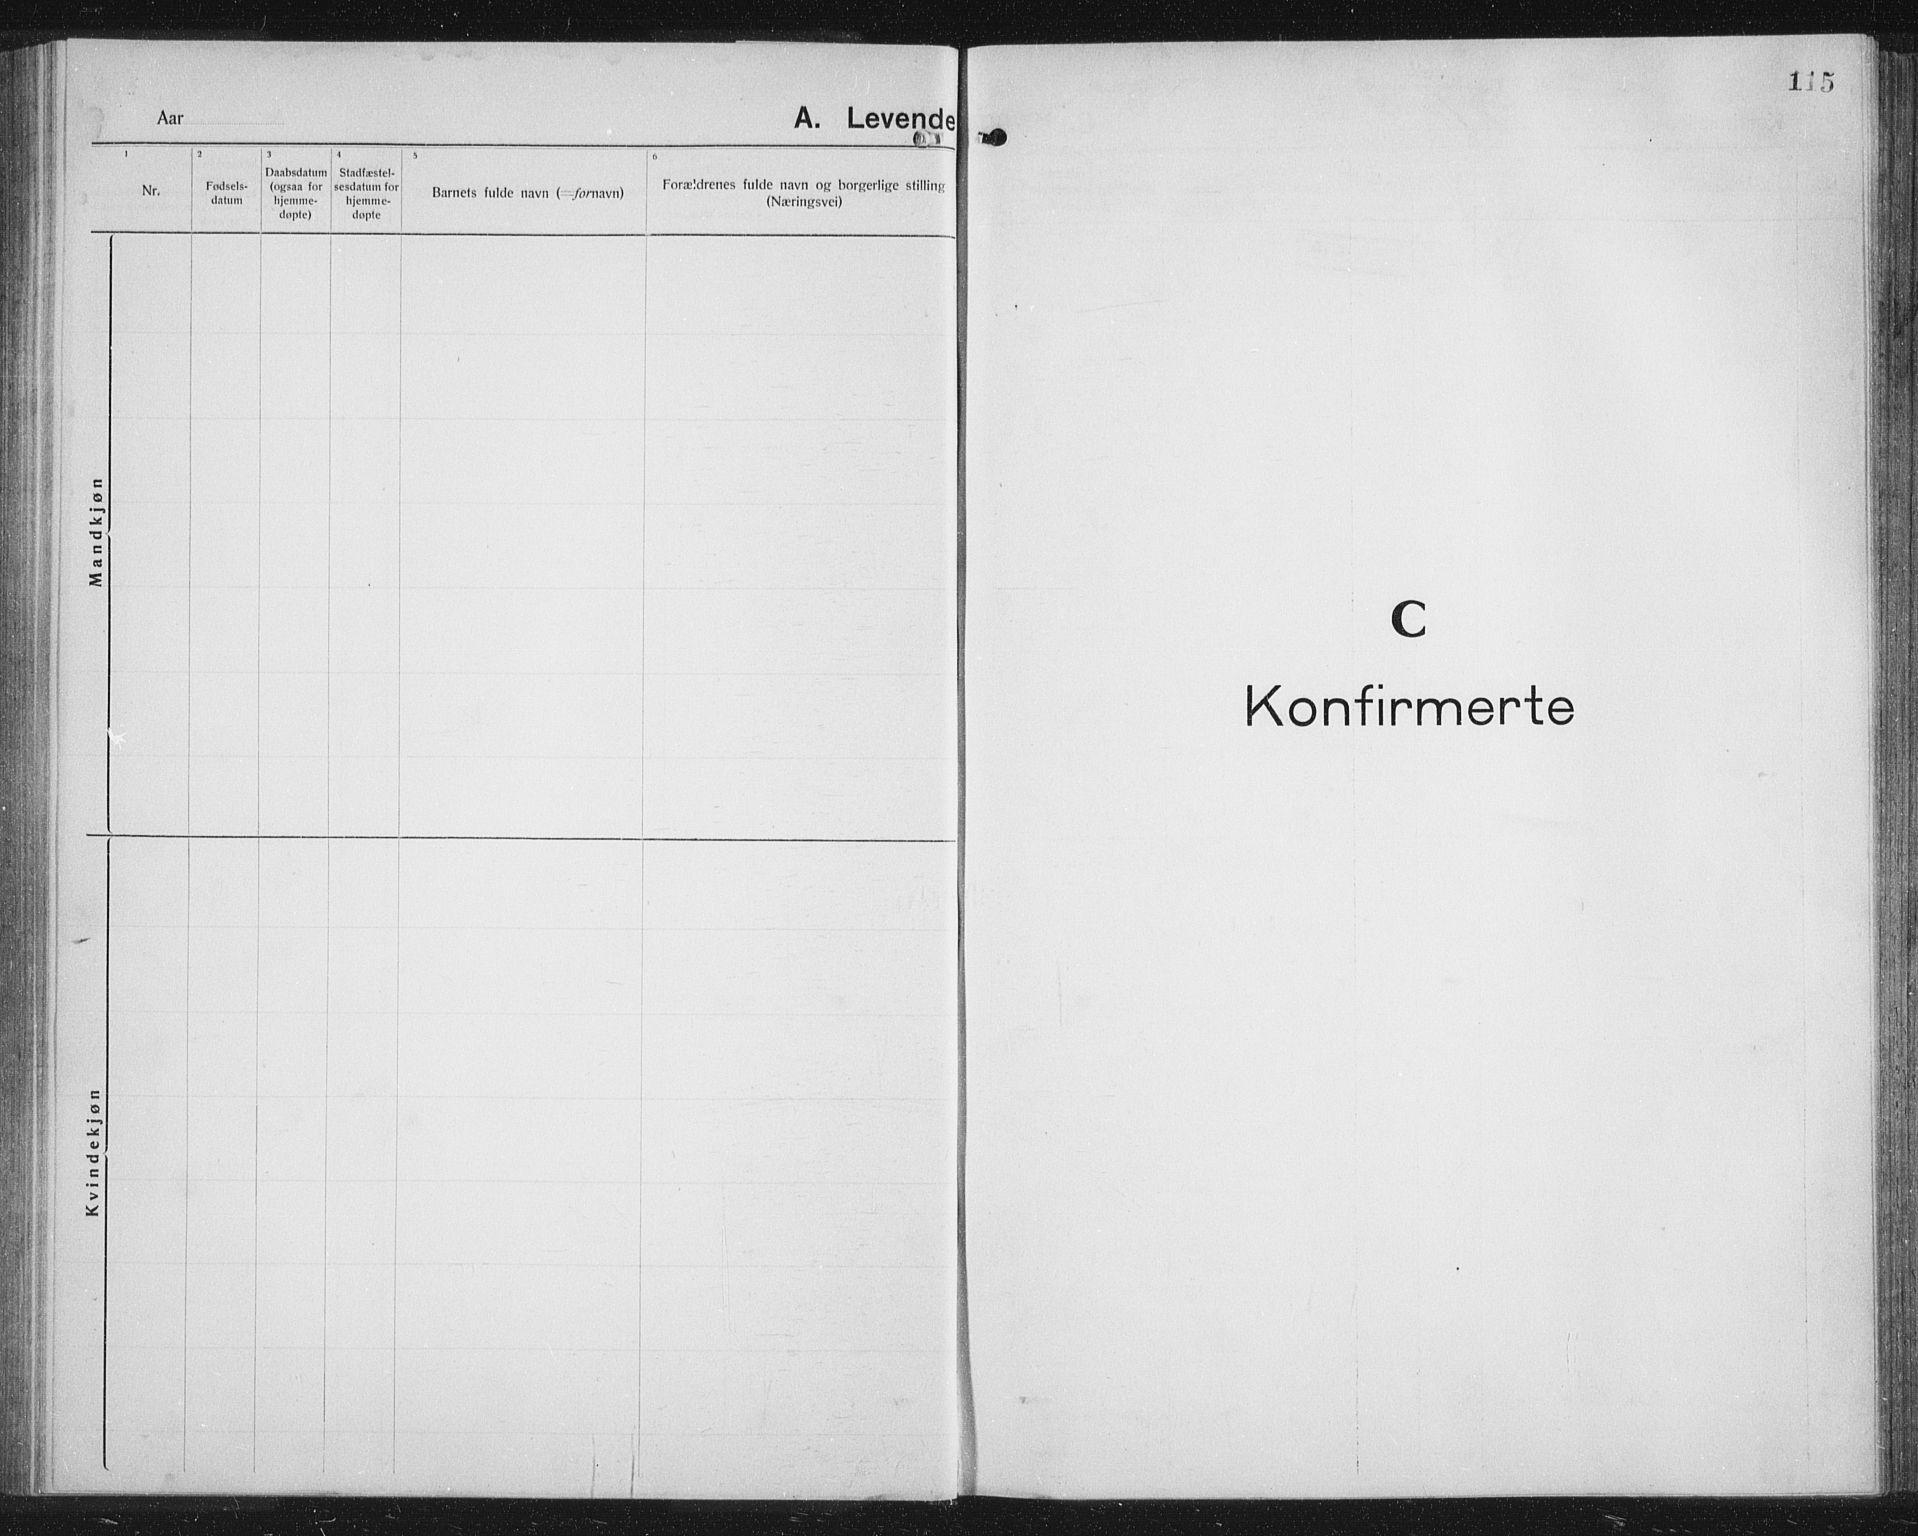 SATØ, Balsfjord sokneprestembete, G/Ga/L0010klokker: Parish register (copy) no. 10, 1921-1936, p. 115